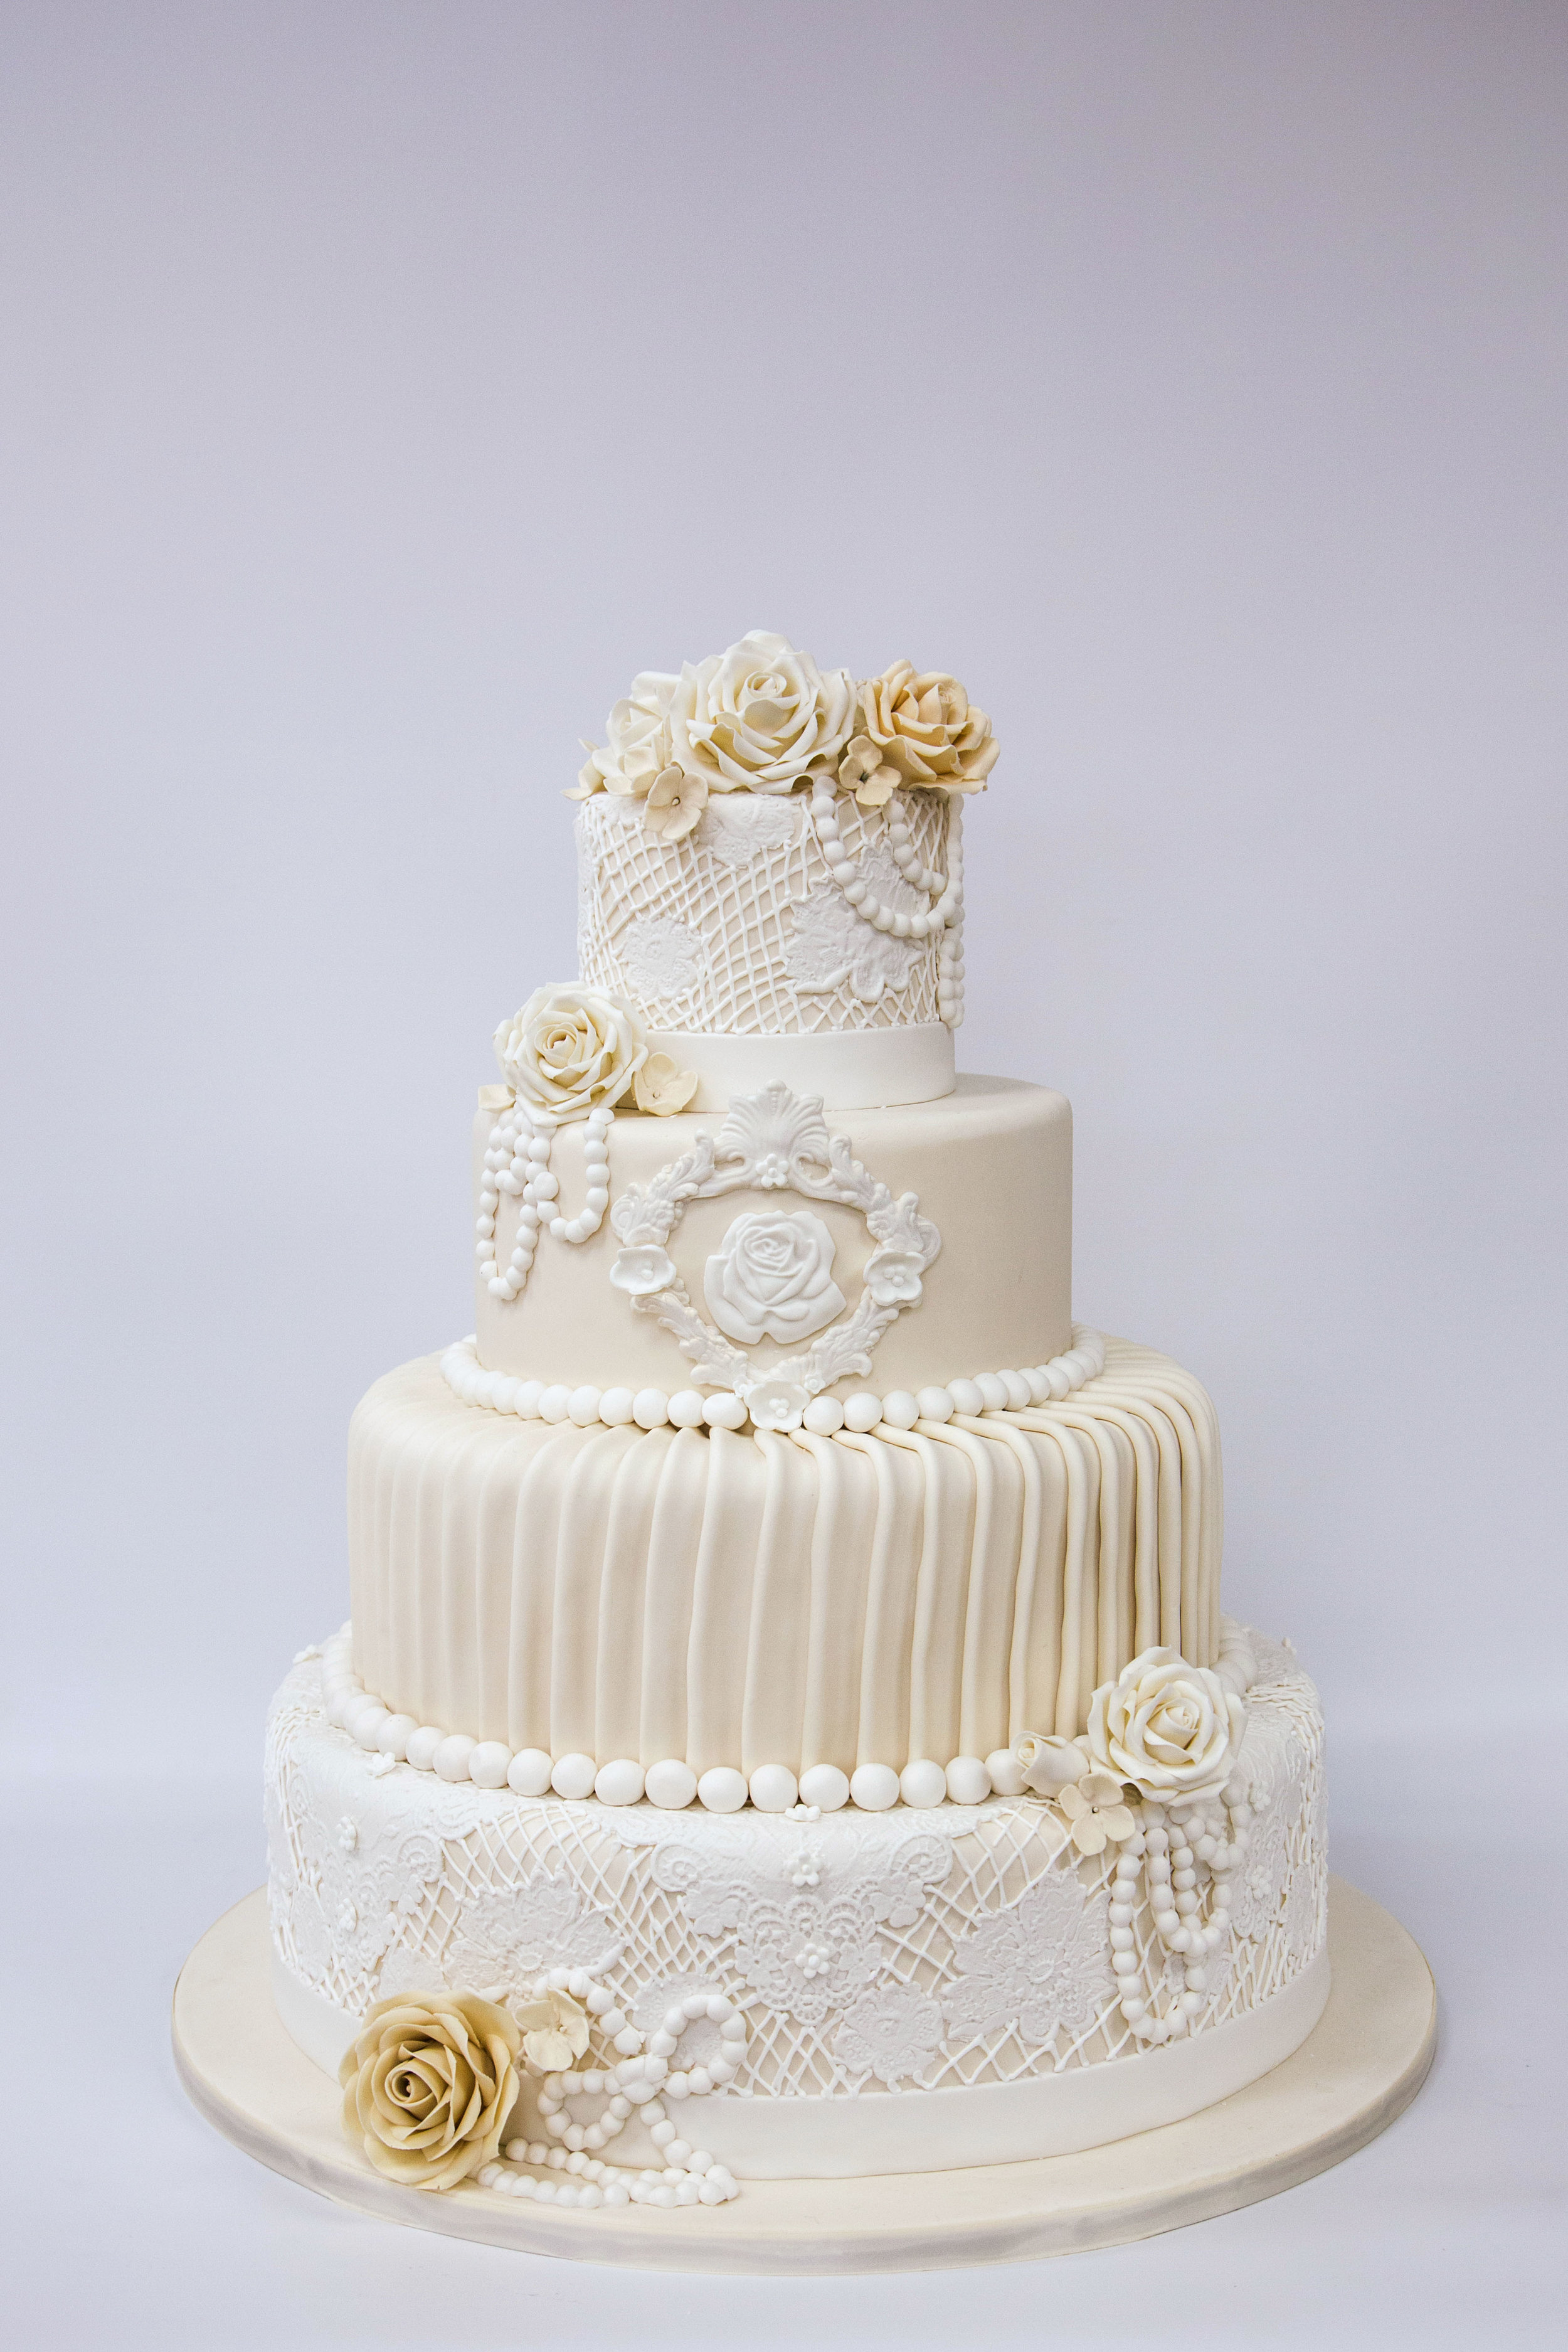 cake-7 copy.jpg